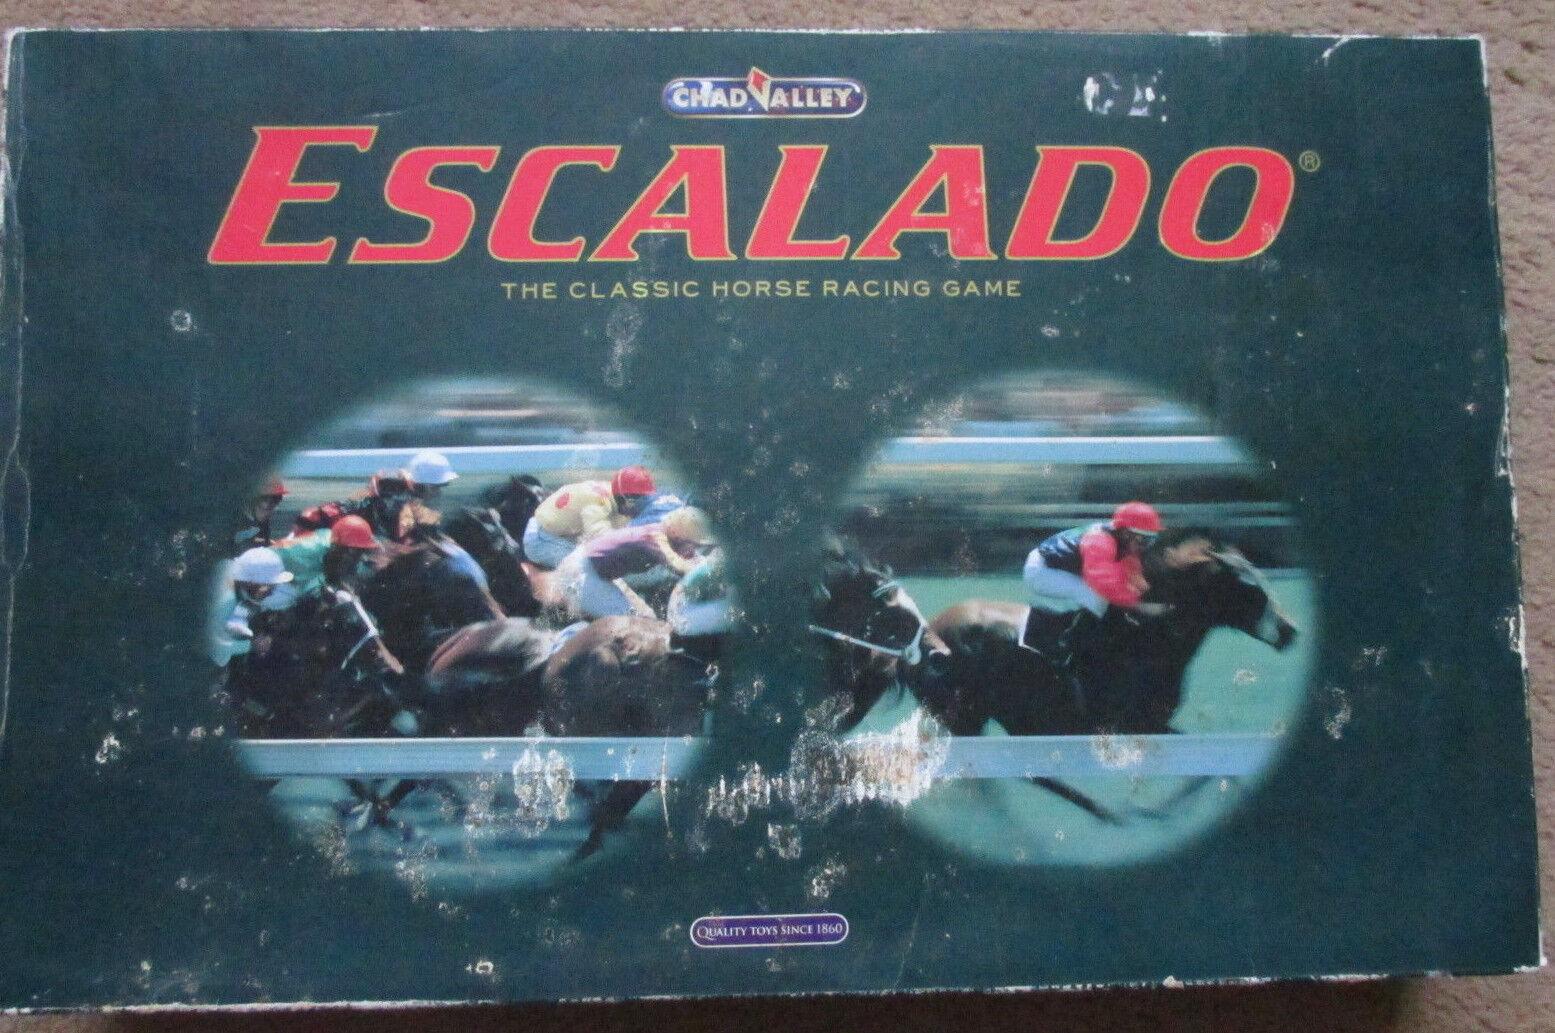 ESCALADO CHAD VALLEY COMPLETE BOARDGAME GAME FAMILY VGC BOARD RPG